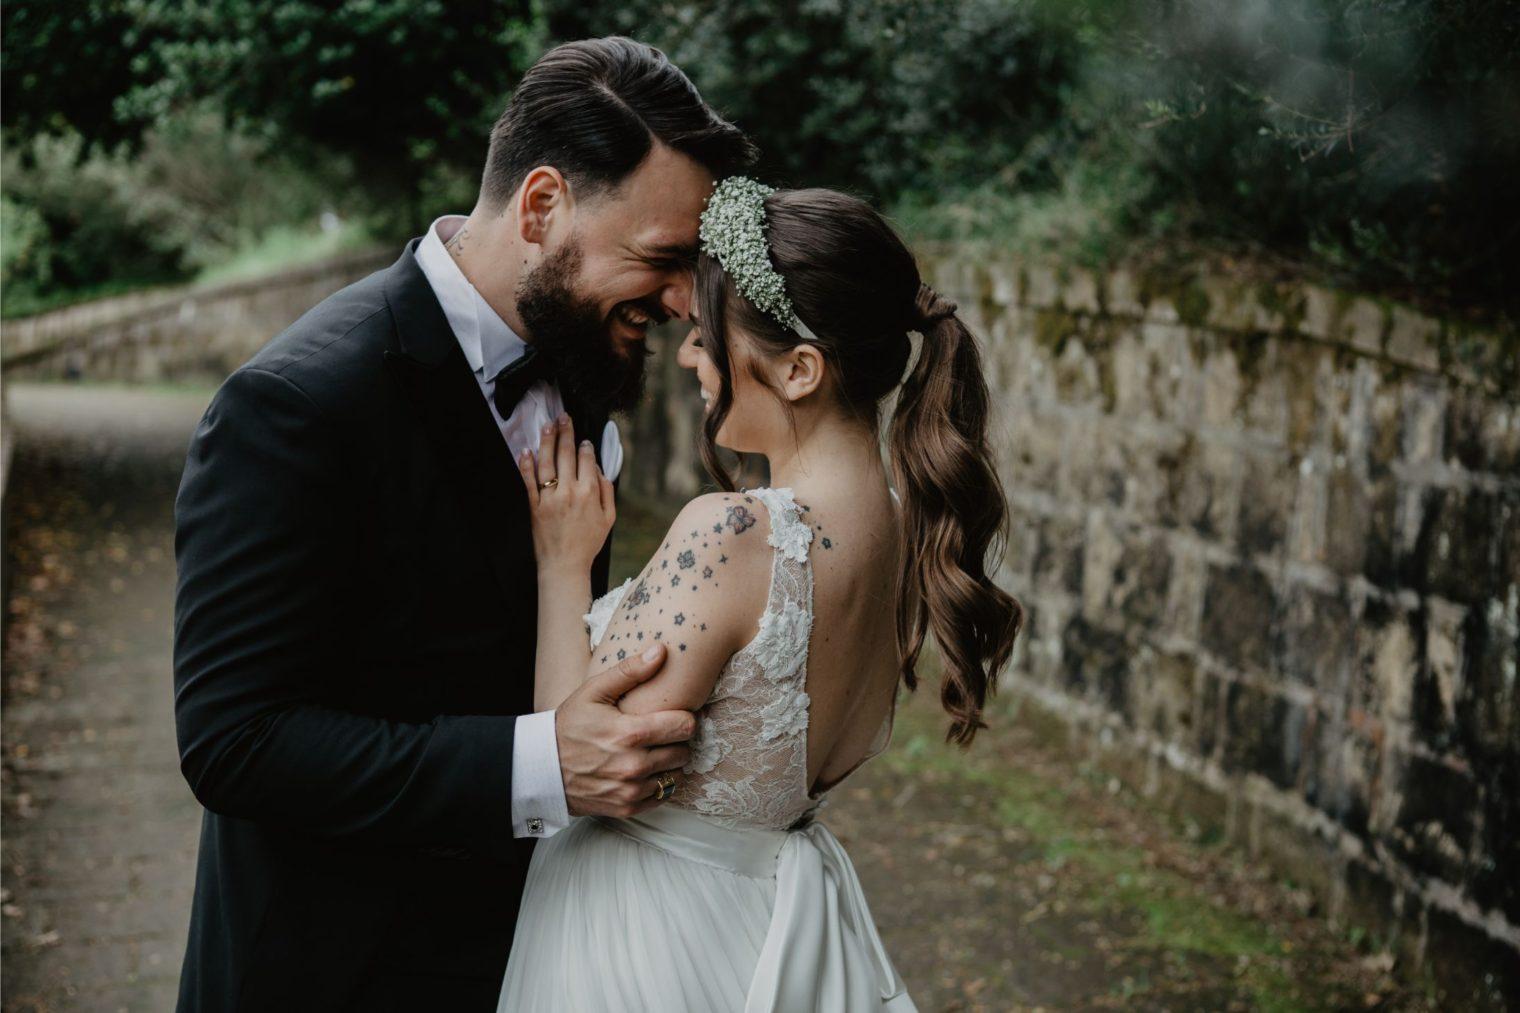 rhamely | fotografa | matrimonio | Mantova